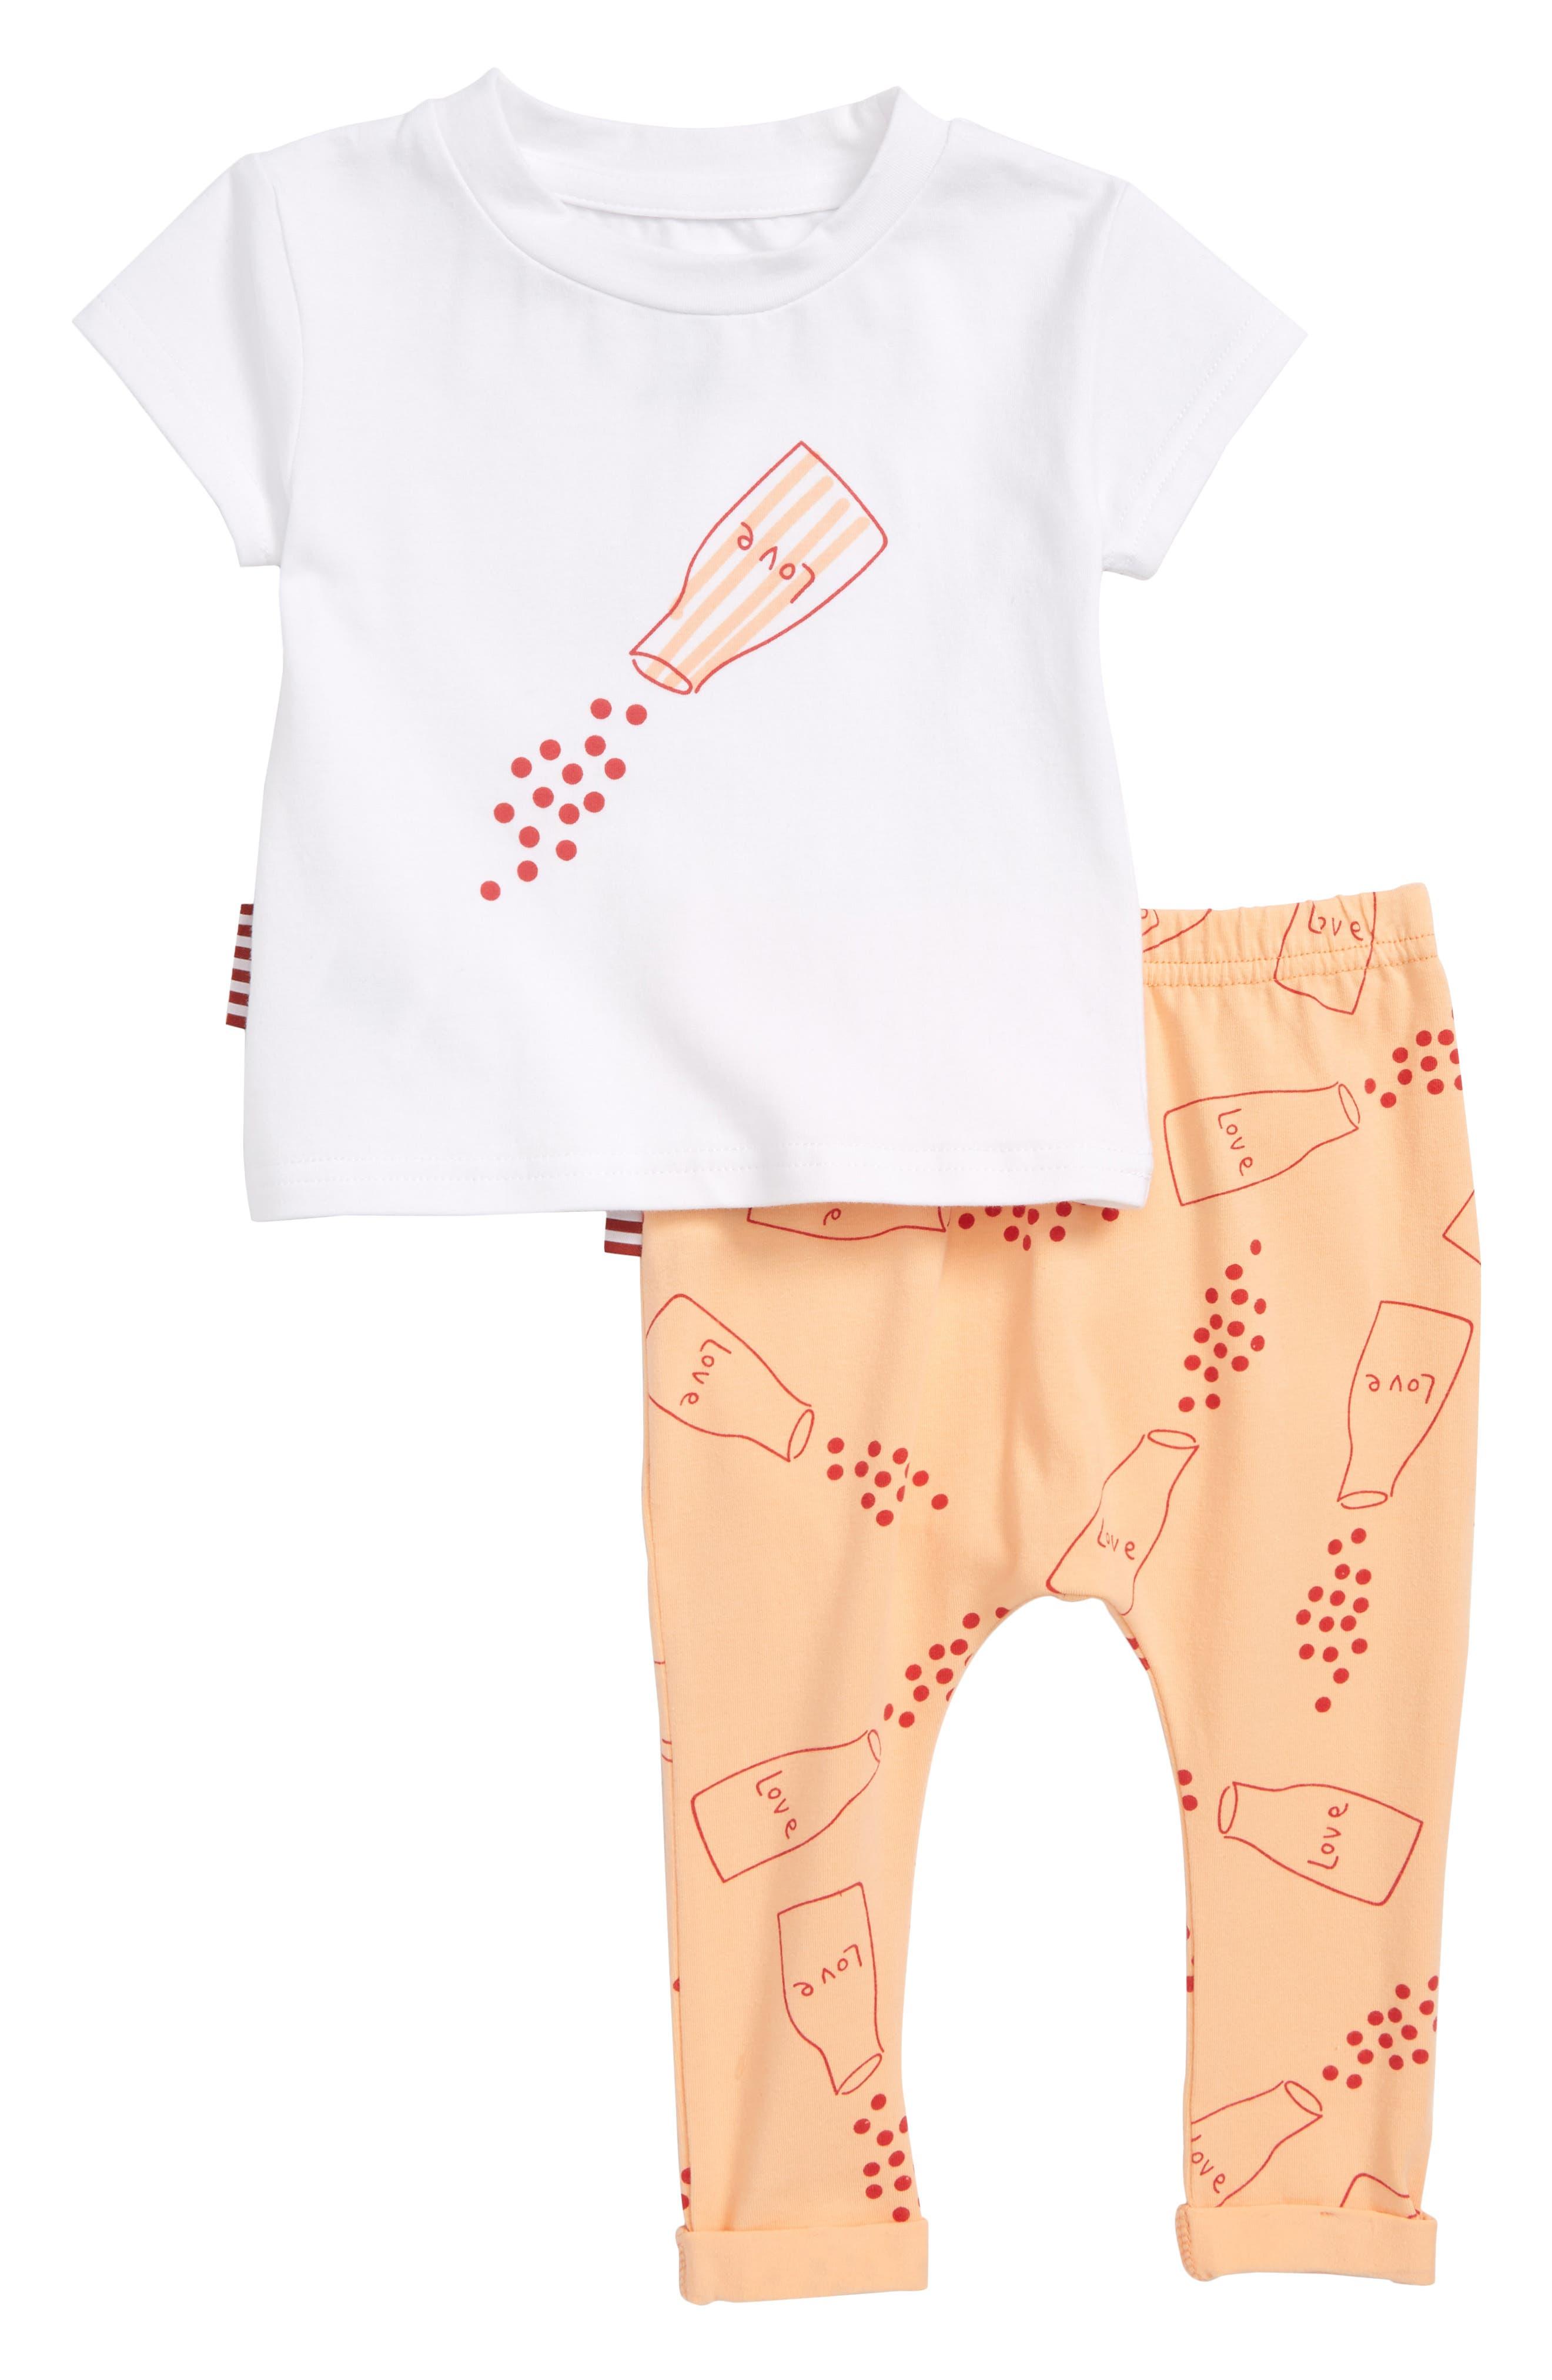 Sprinkle Love Print Tee & Leggings Set,                         Main,                         color, White/ Peach